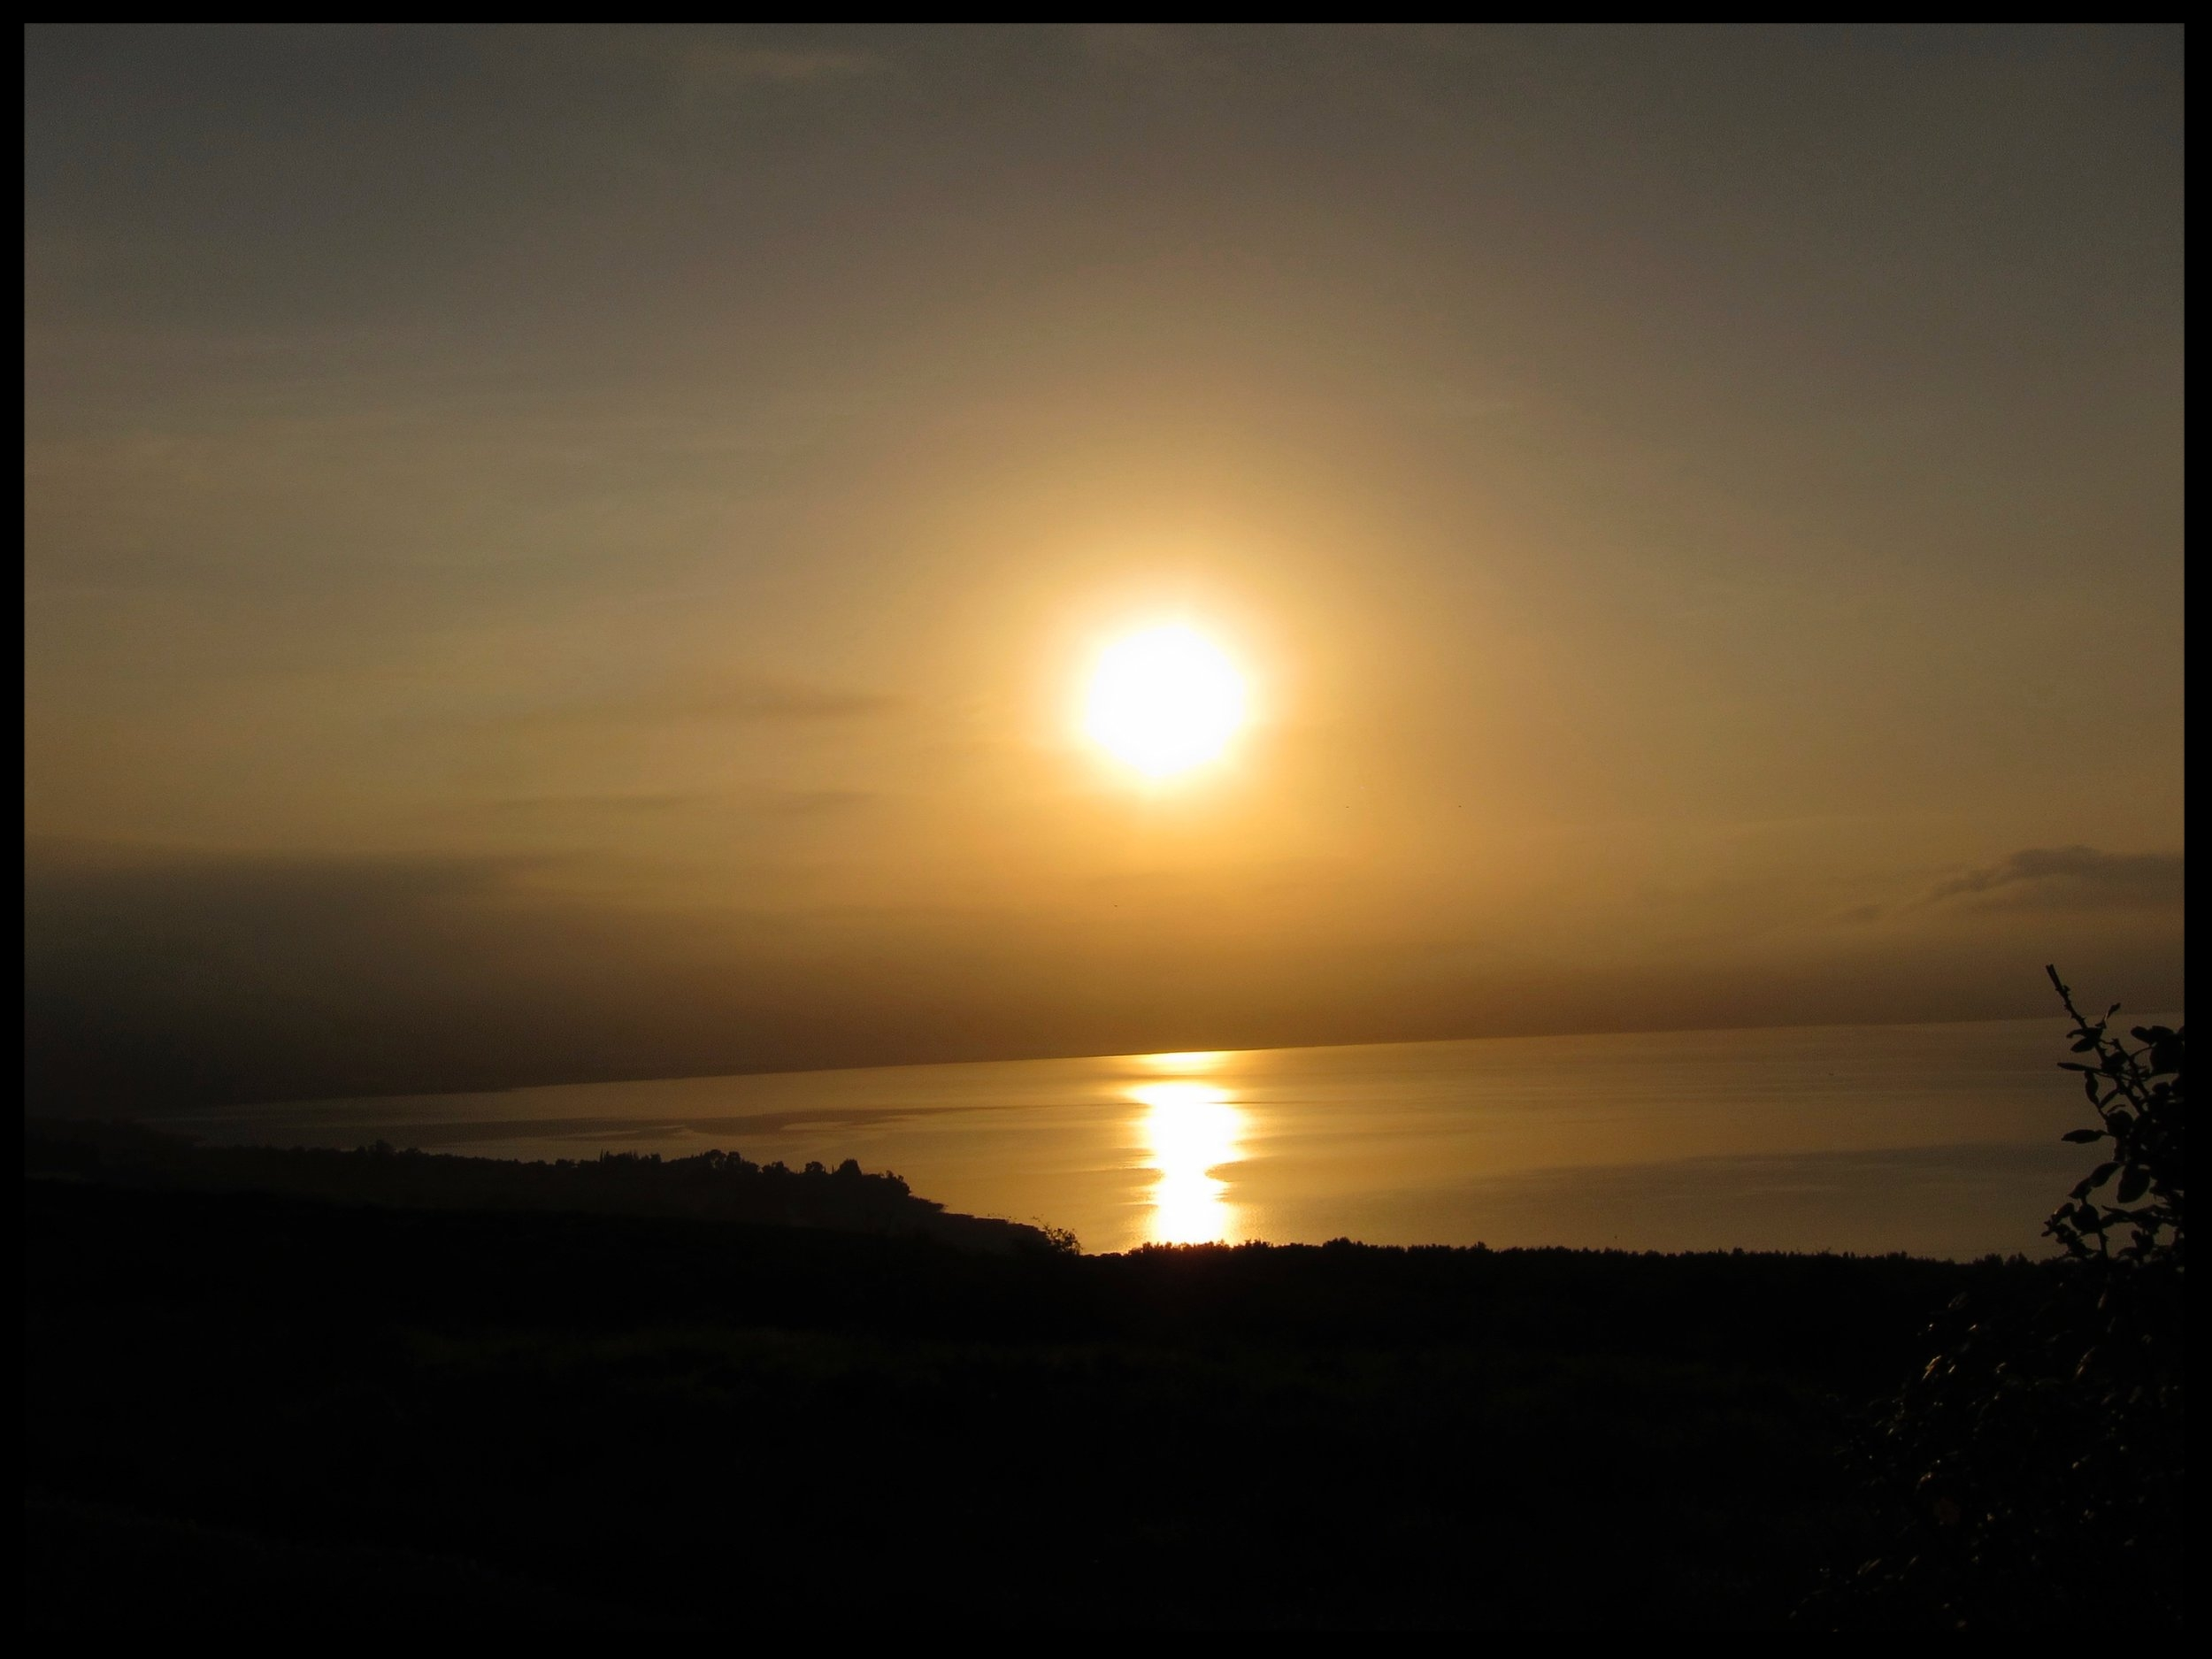 Sunset on the Mount of the Beatitudes